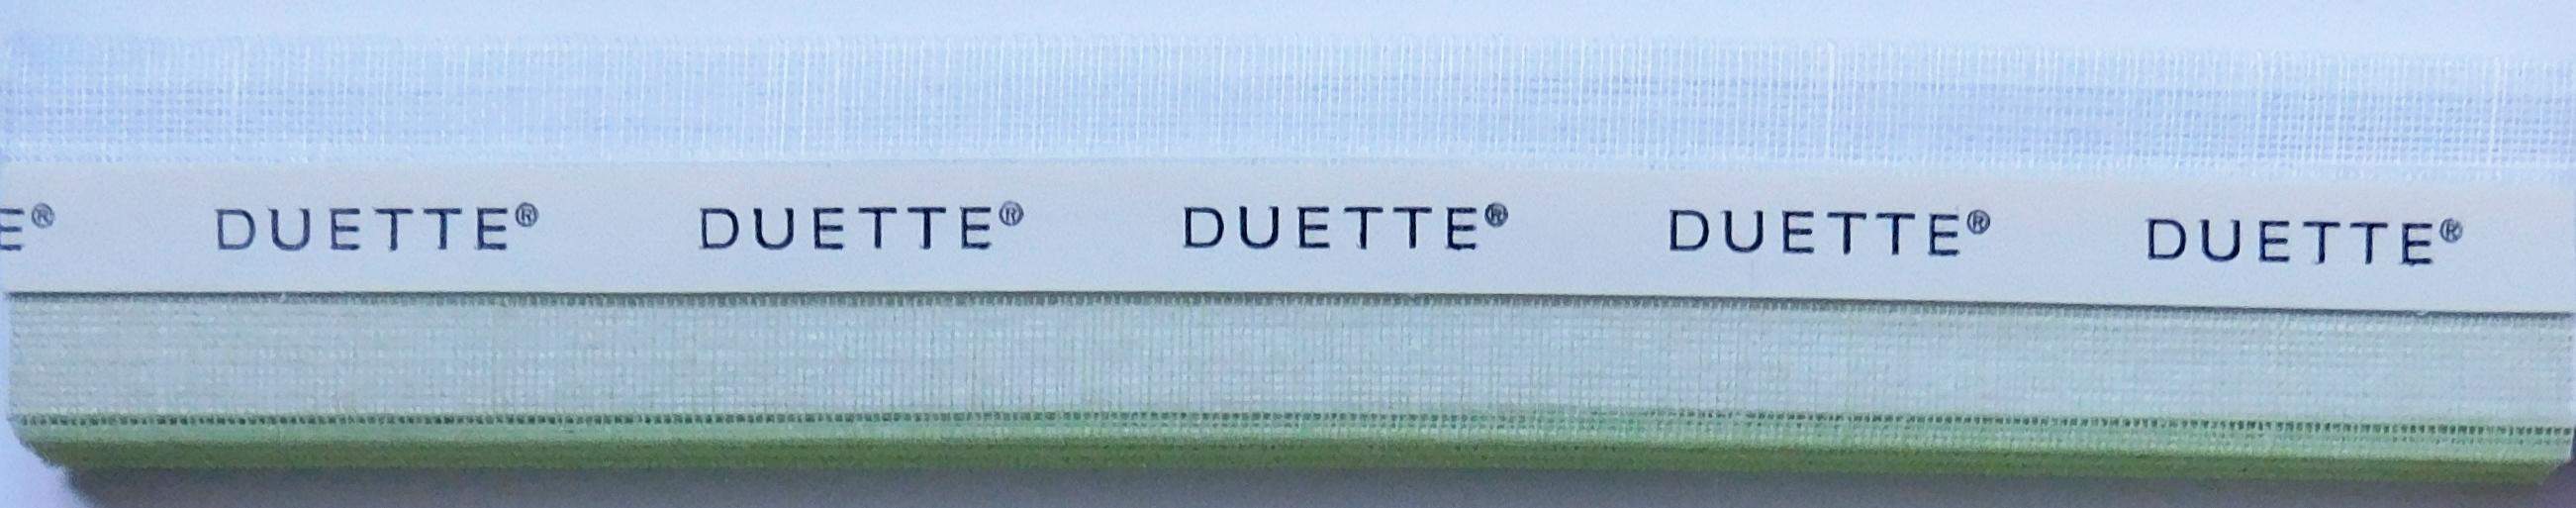 Batiste Sheer Apple Green Duette Blind Fabric Sample